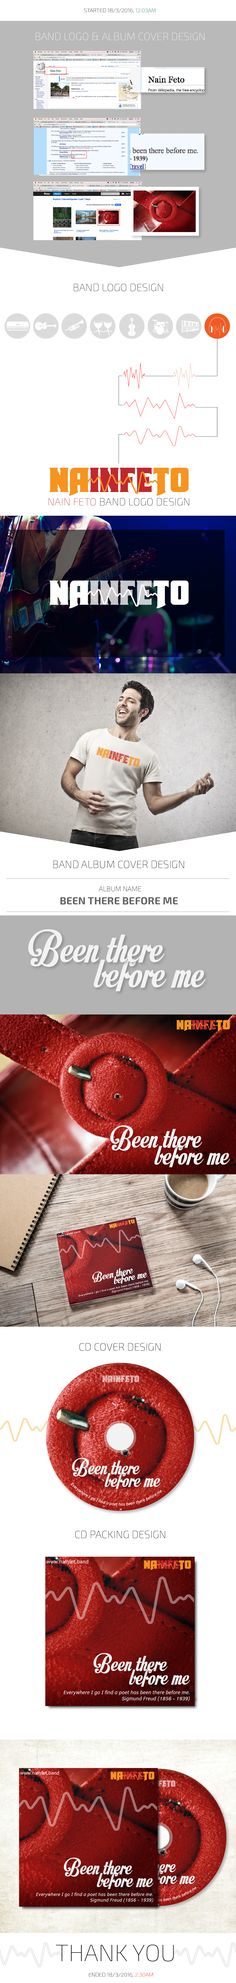 Chocolate Milk Great Original Print Ad! NesQuik T-Rex Nestle Quick Bunny Quiky